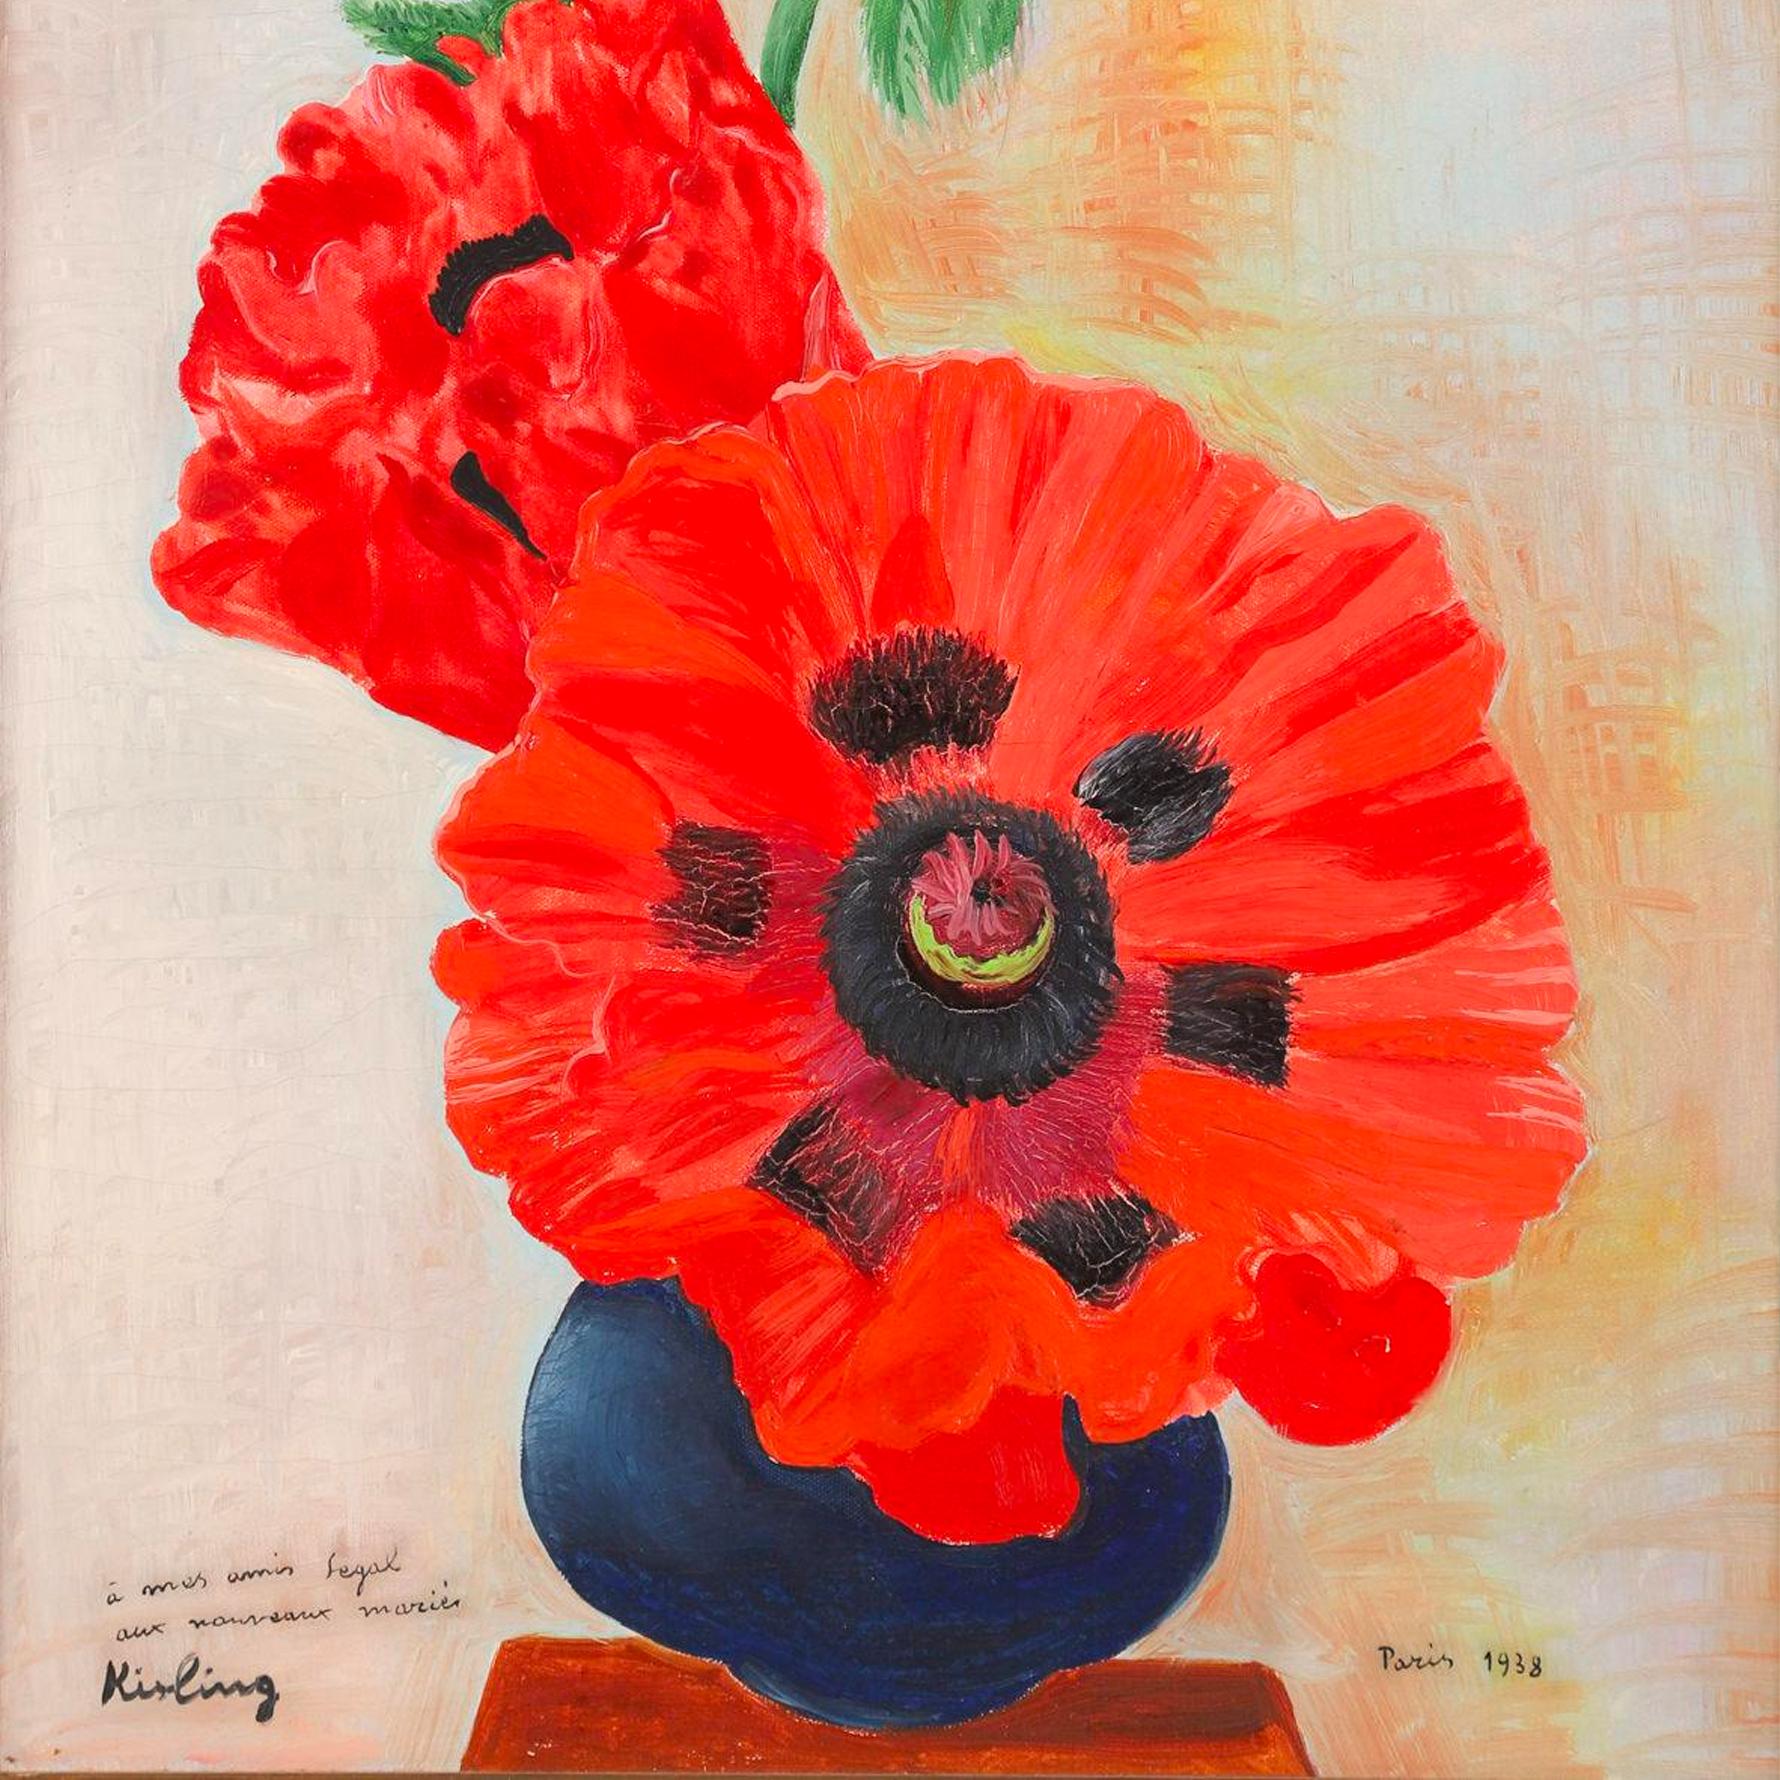 Artist Profile: Moise Kisling (Polish/French, 1891–1953)